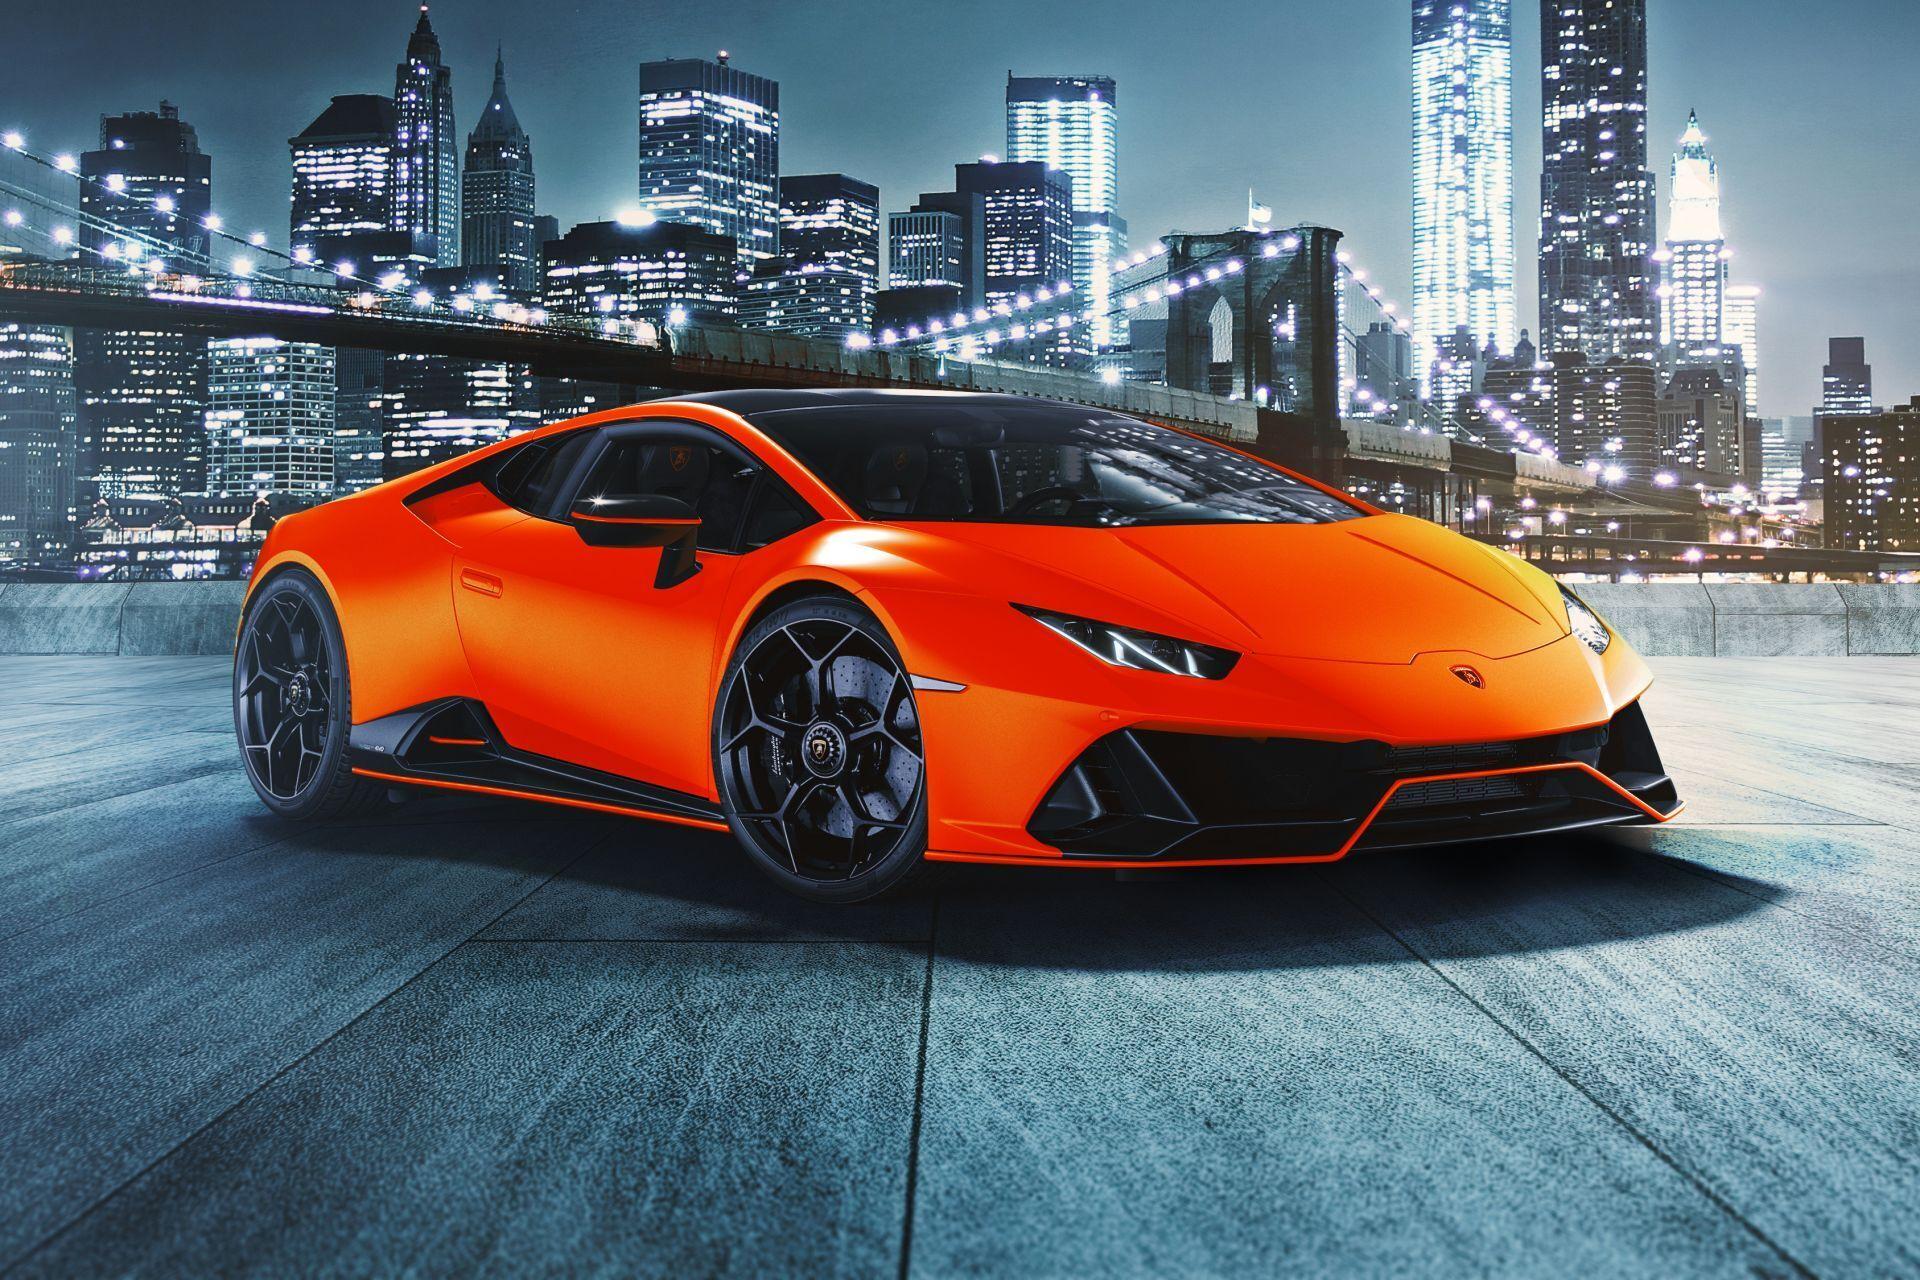 2021 Lamborghini Huracan Evo Fluo Capsule в кольорі Arancio Dac